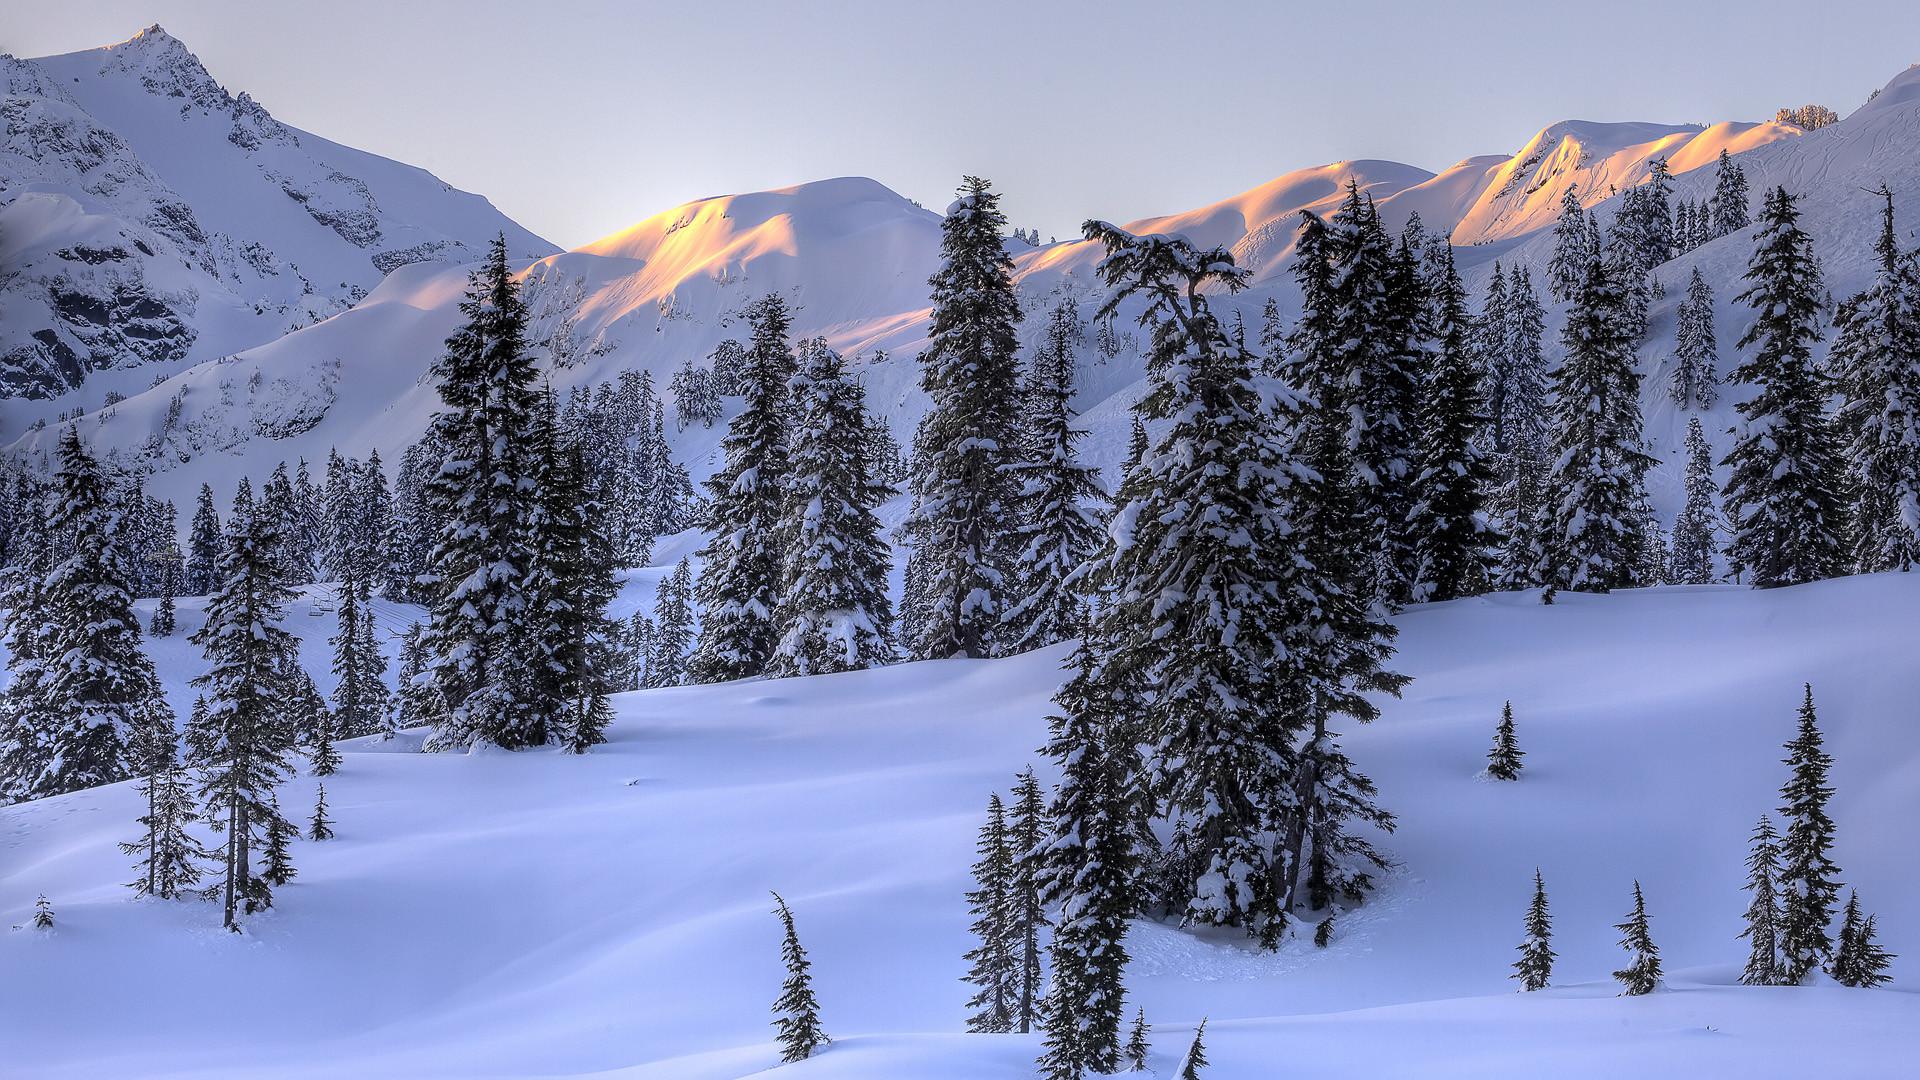 1080p Snow Scenes Vol.2 No.13 – 1920×1080 – PicRolls – Free Wallpaper    Nature HD wallpapers